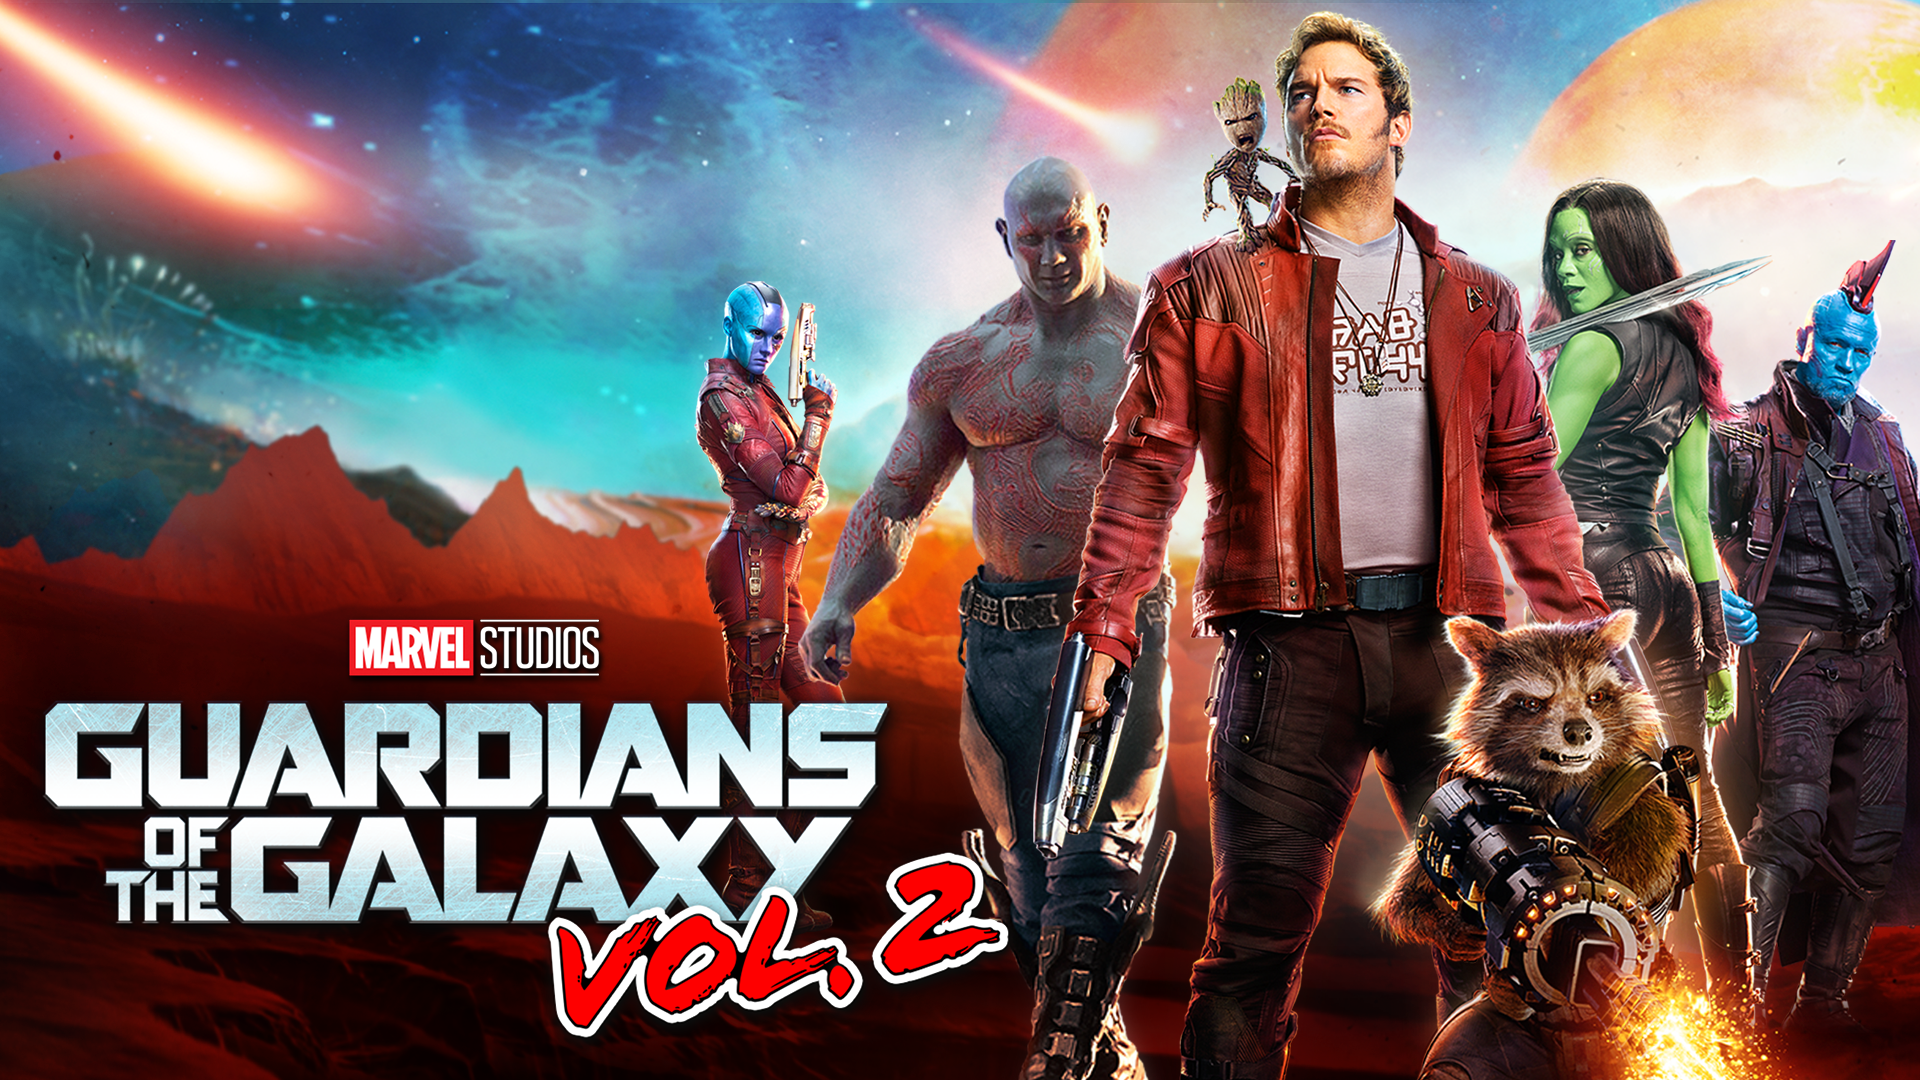 Watch Marvel Studios Guardians Of The Galaxy Vol 2 Disney